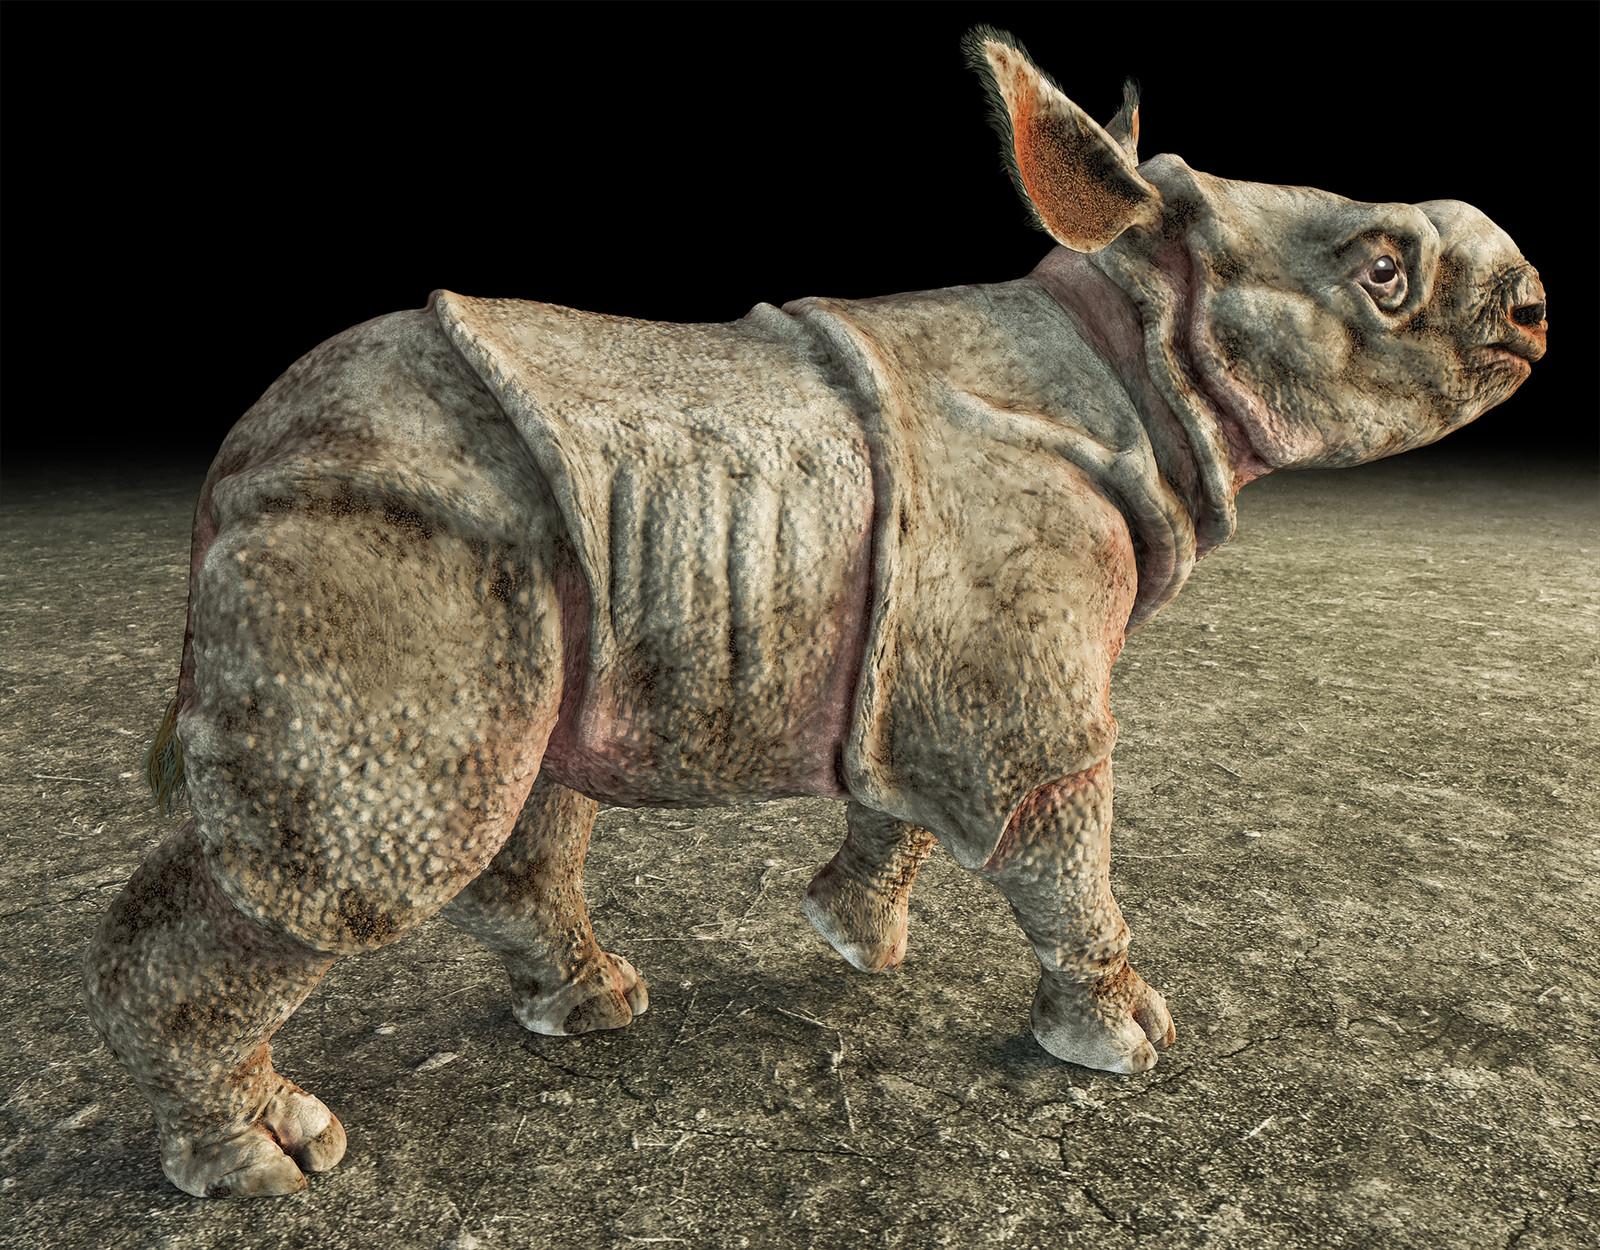 Baby Rhino project: Indian rhino